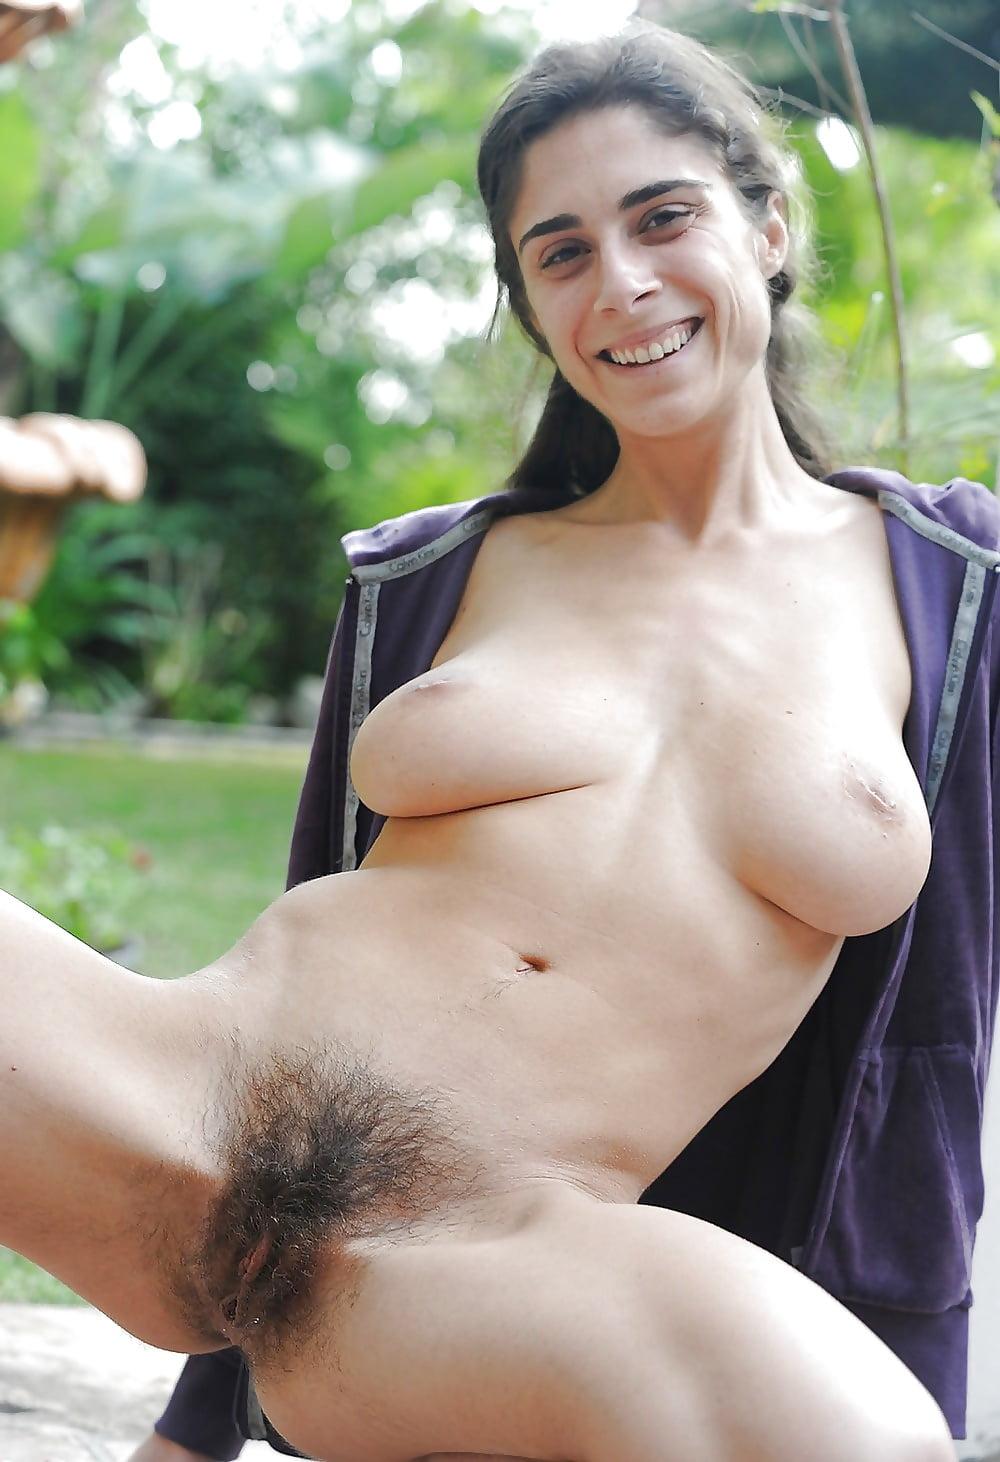 girls-outdoor-hairy-italian-woman-nude